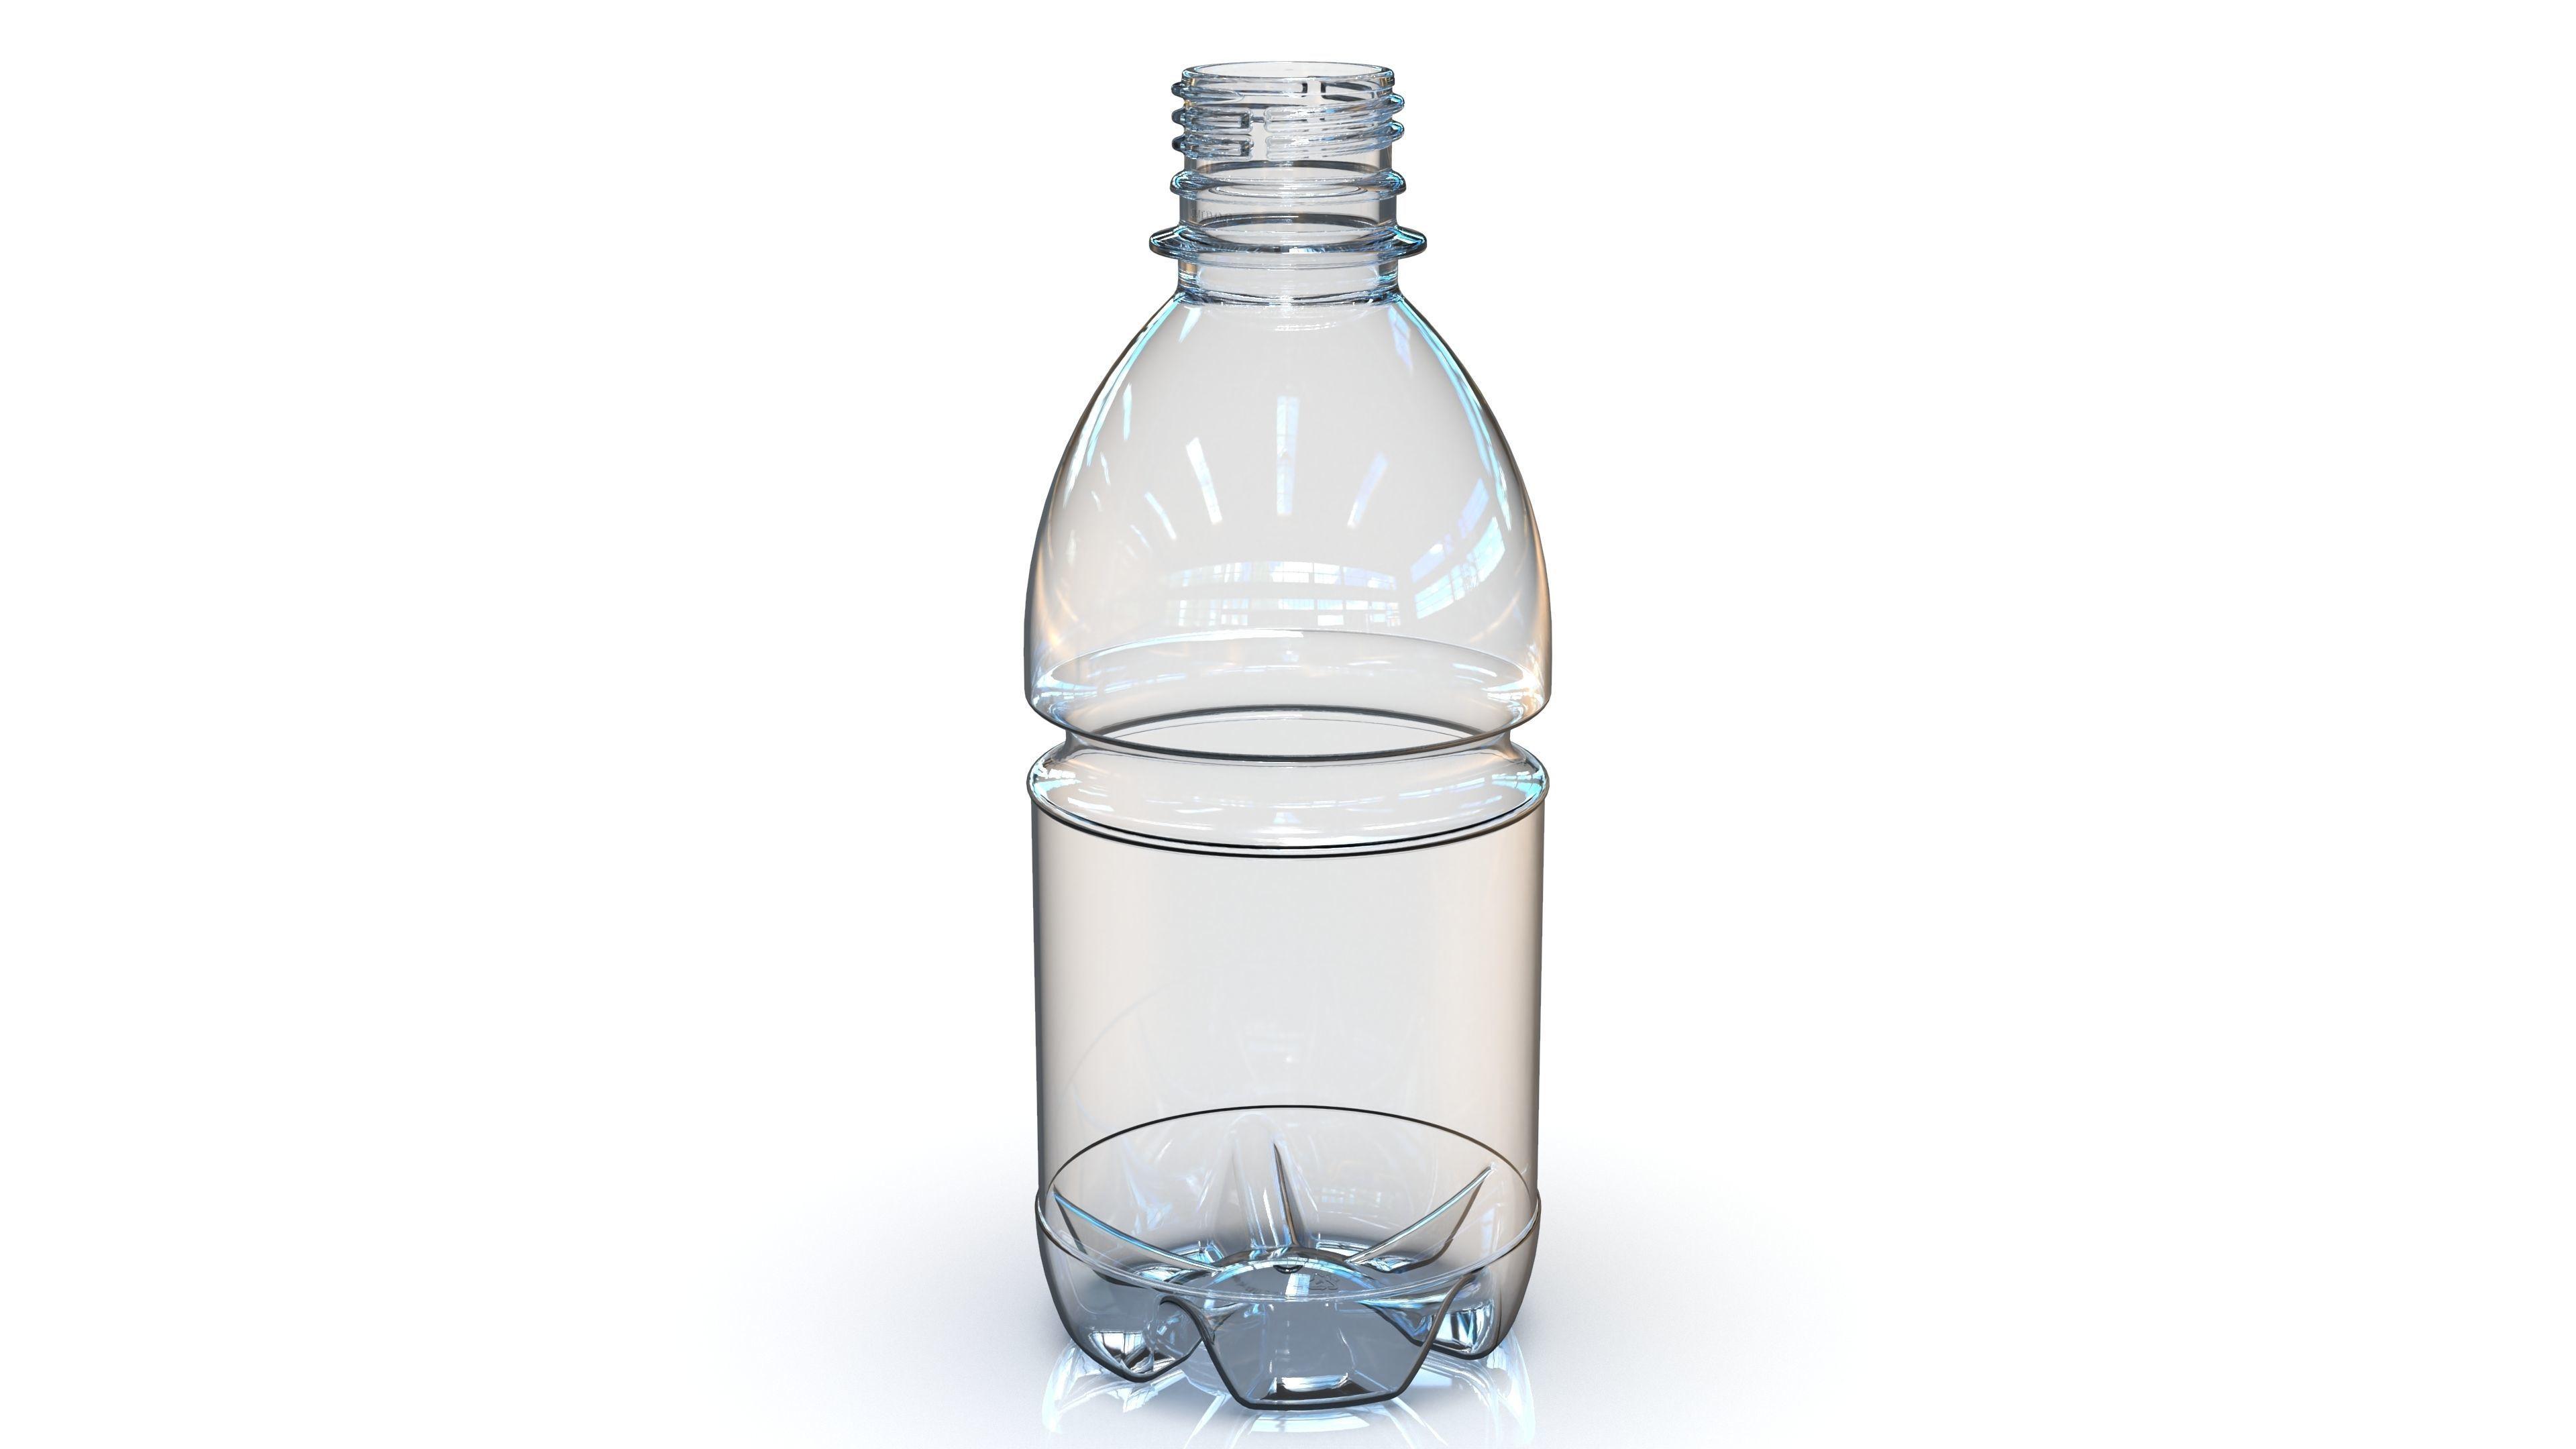 PET Bottle PCO - 1810 - 28 mm 330 mL - for water - drinks - etc